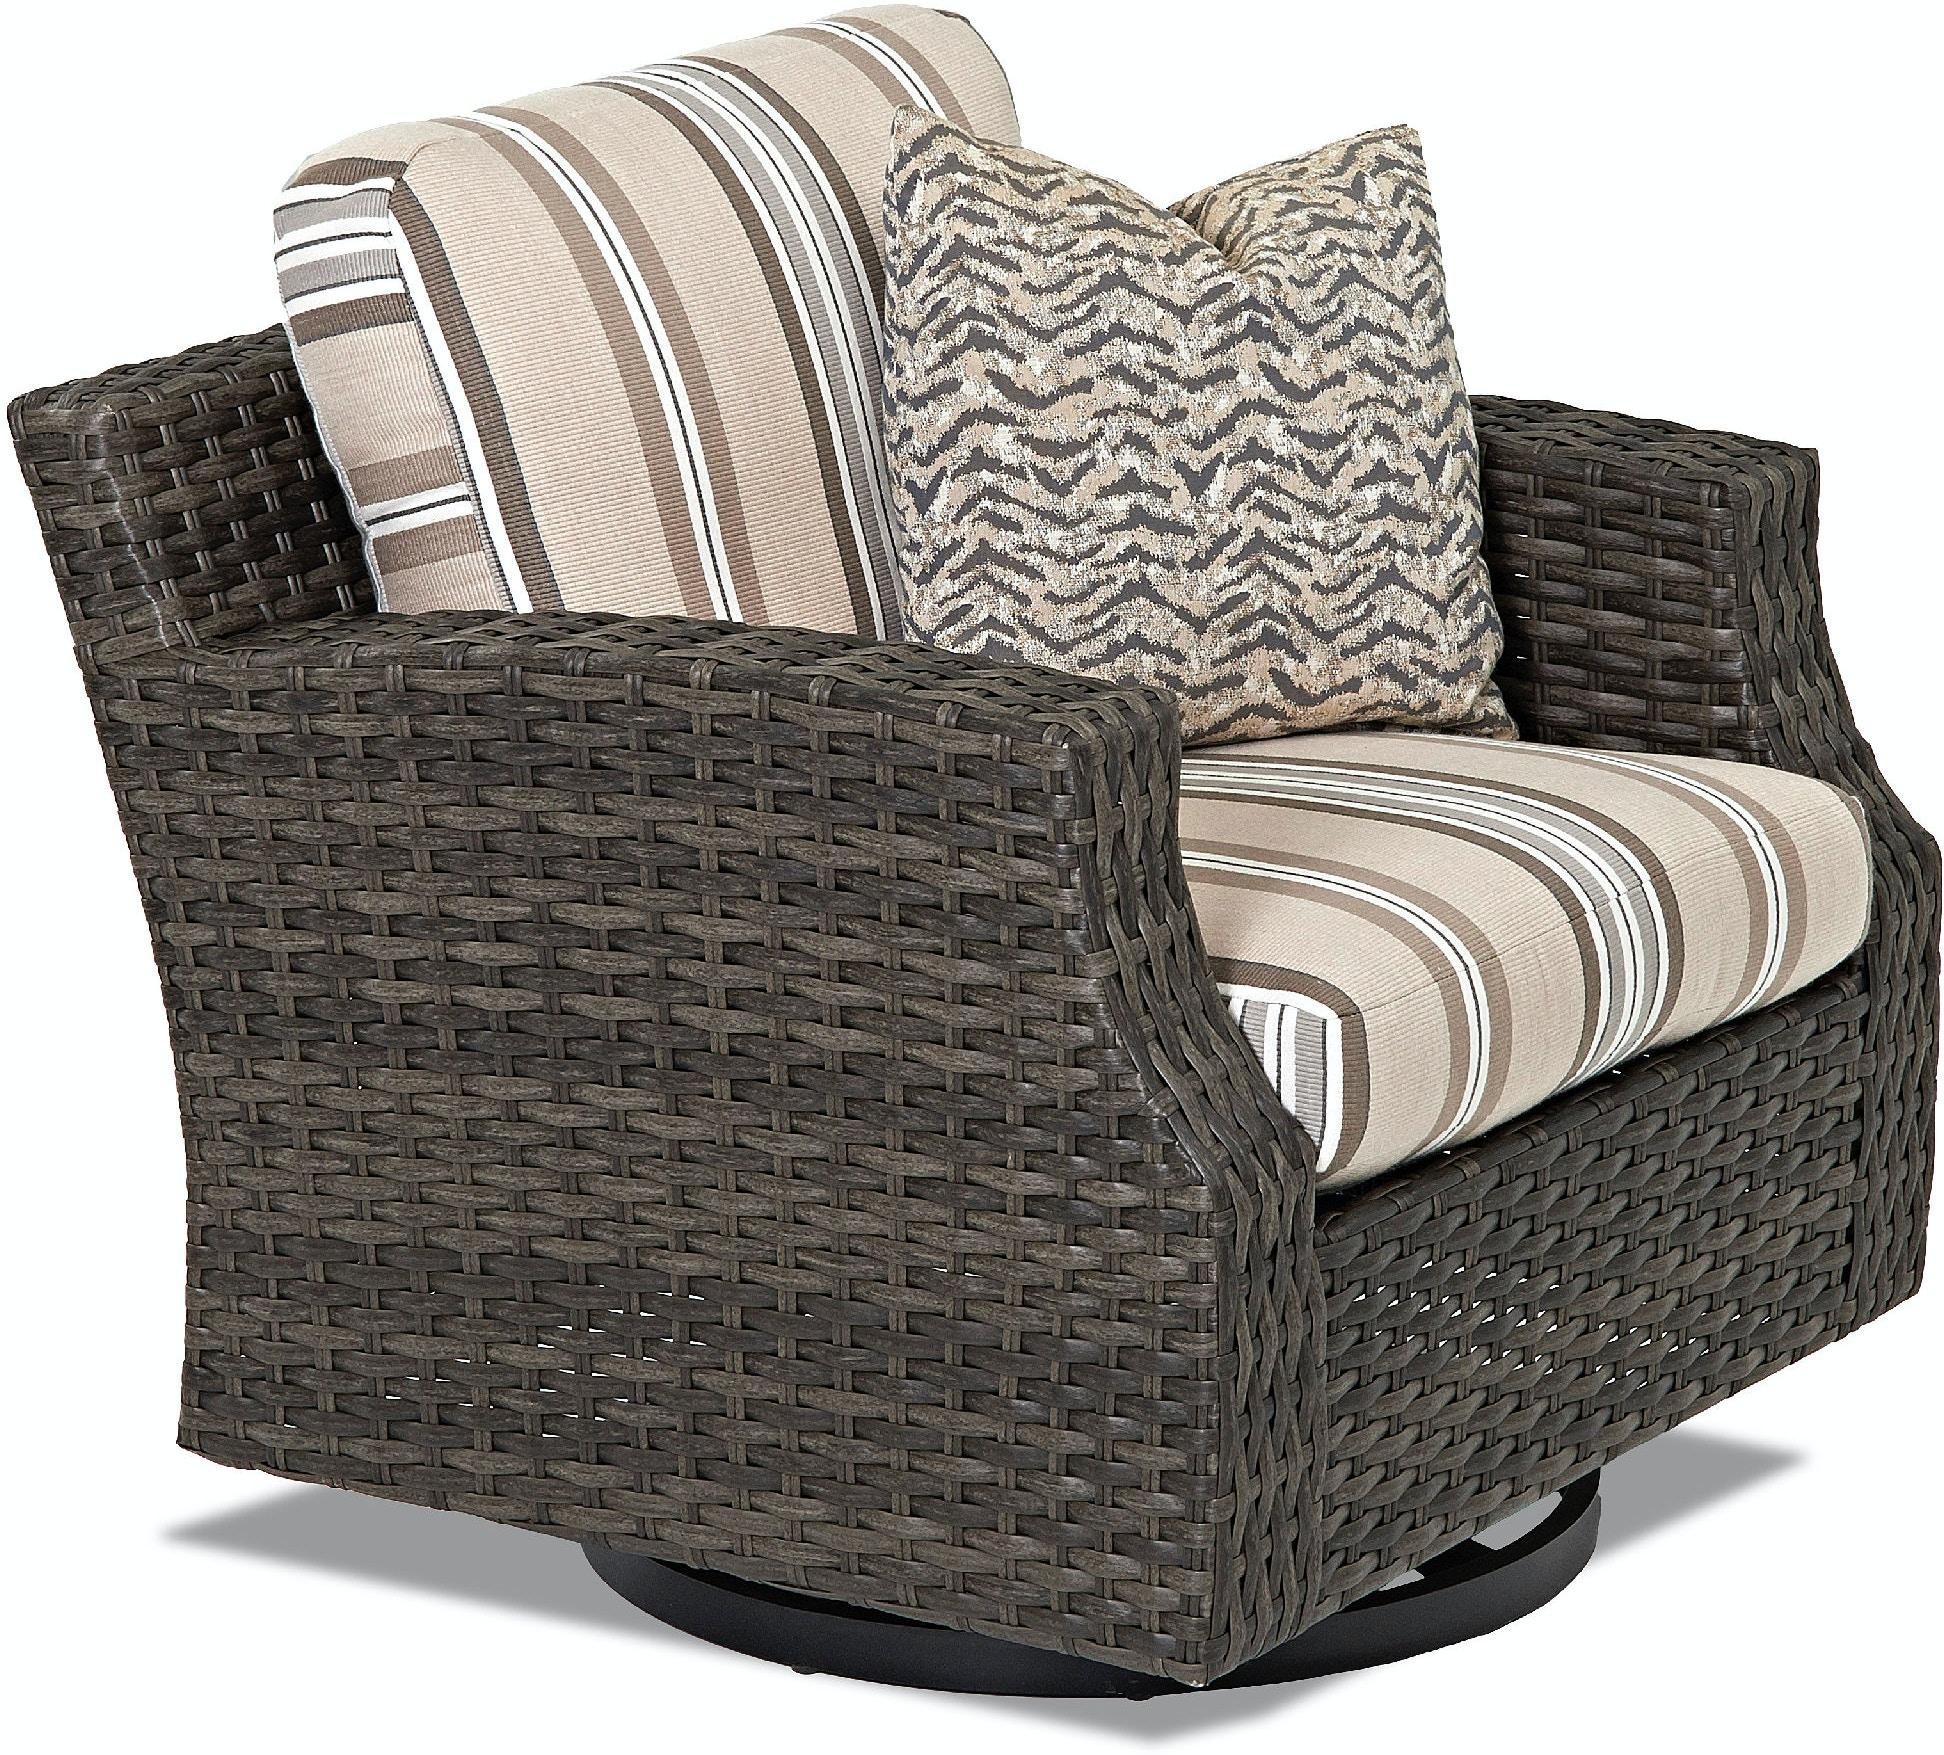 Klaussner Outdoor Outdoor Patio Cascade Swivel Glider Chair W5000 SGC Klaus